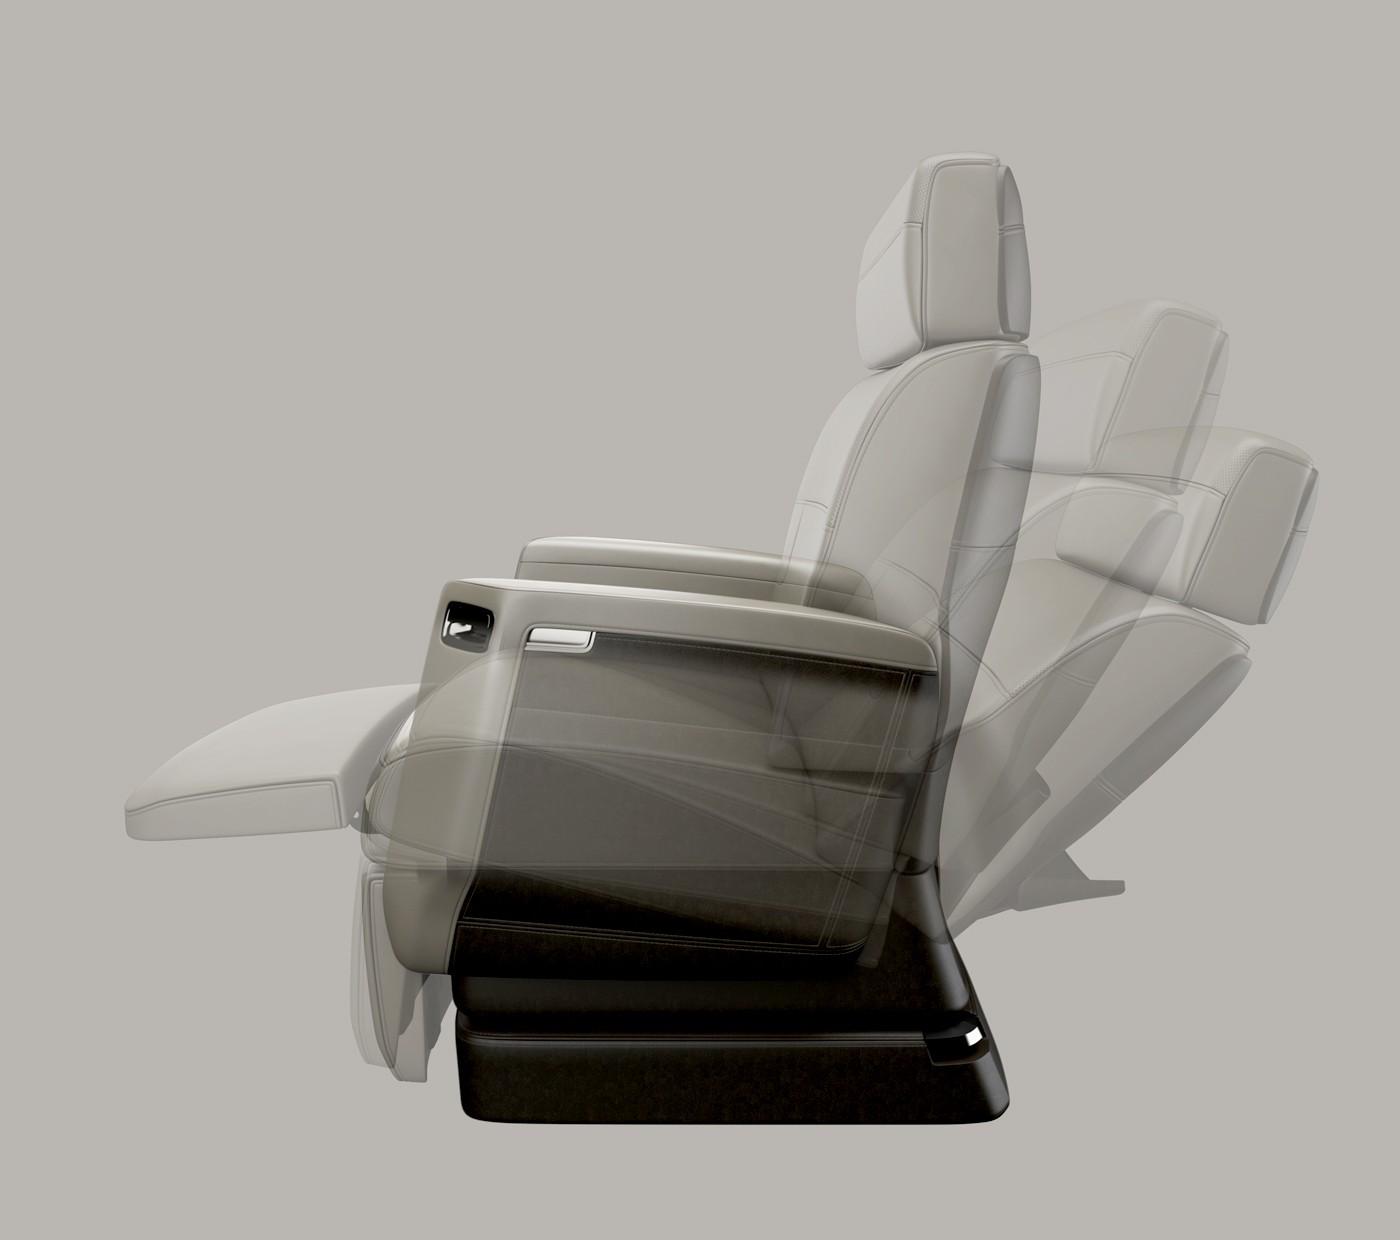 nuage seat